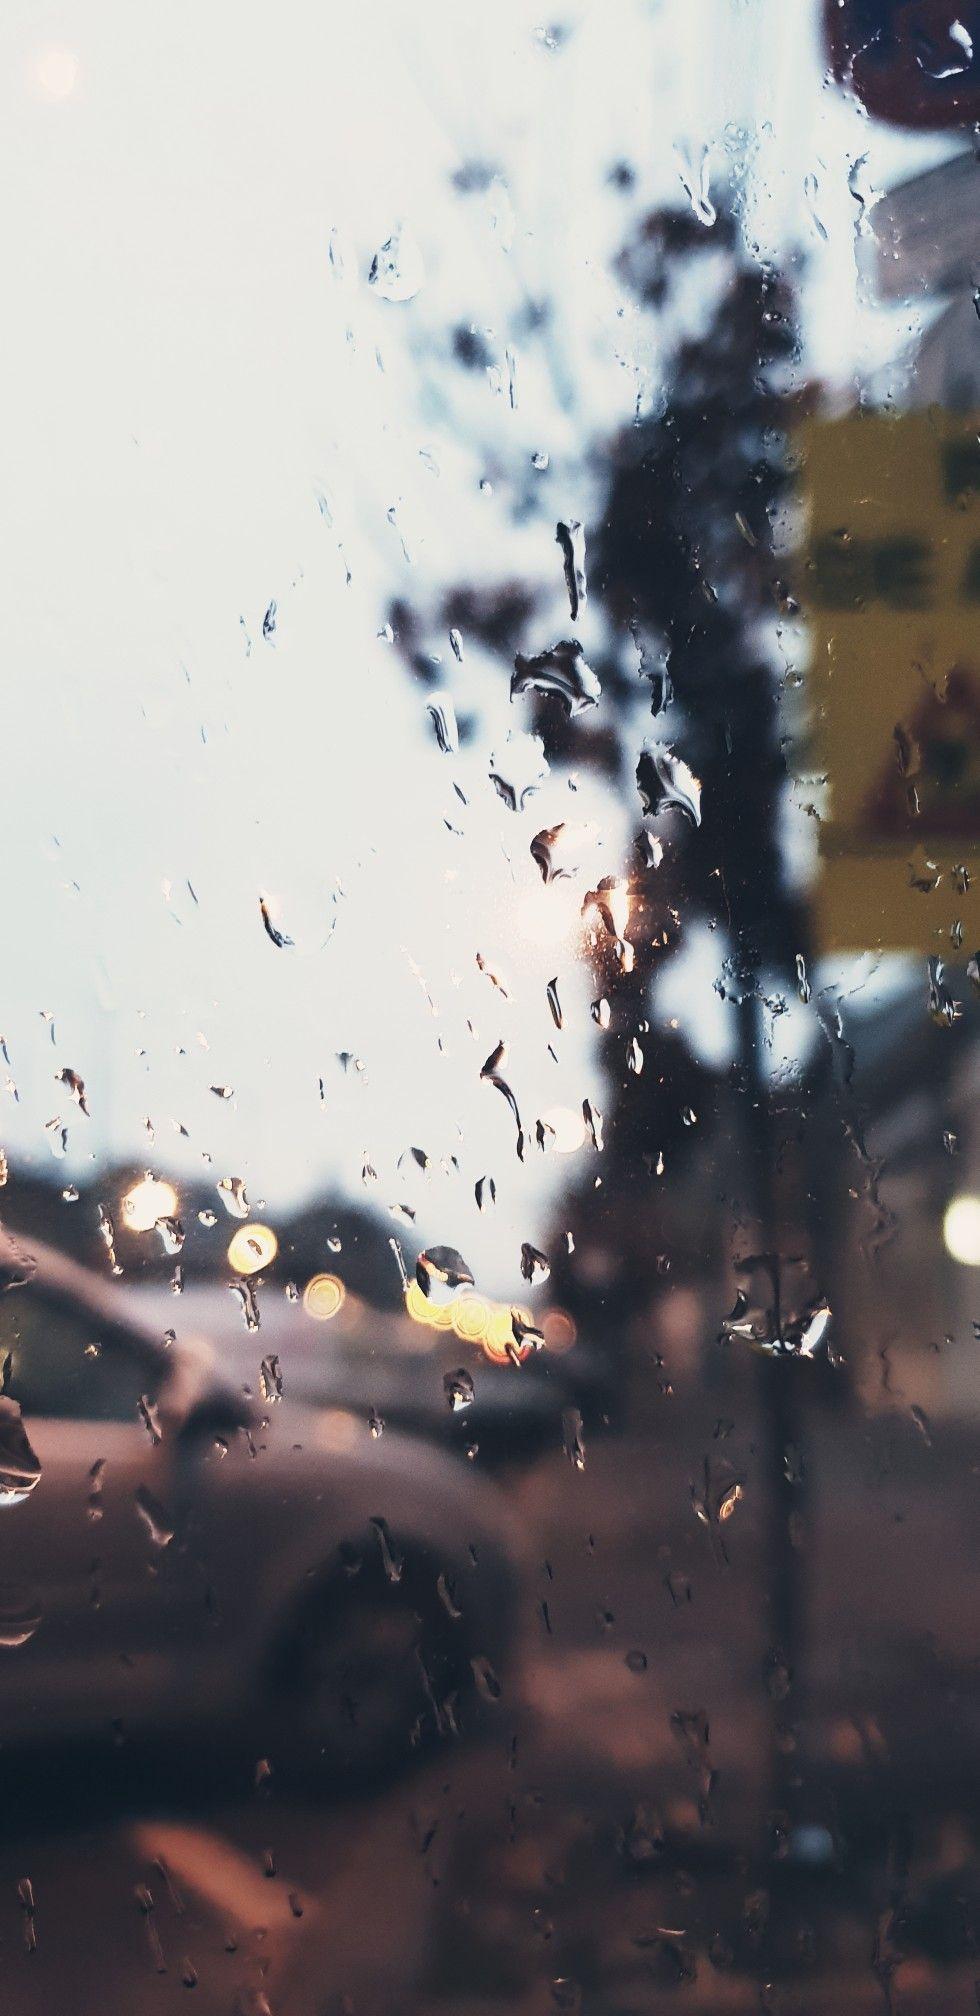 Samsung Wallpaper Autumn Hintergrundbild Tapete Rain Autumn Winter Wallpaper Street Car For Samsung S9 Winter Wallpaper Samsung Wallpaper Rain Wallpapers